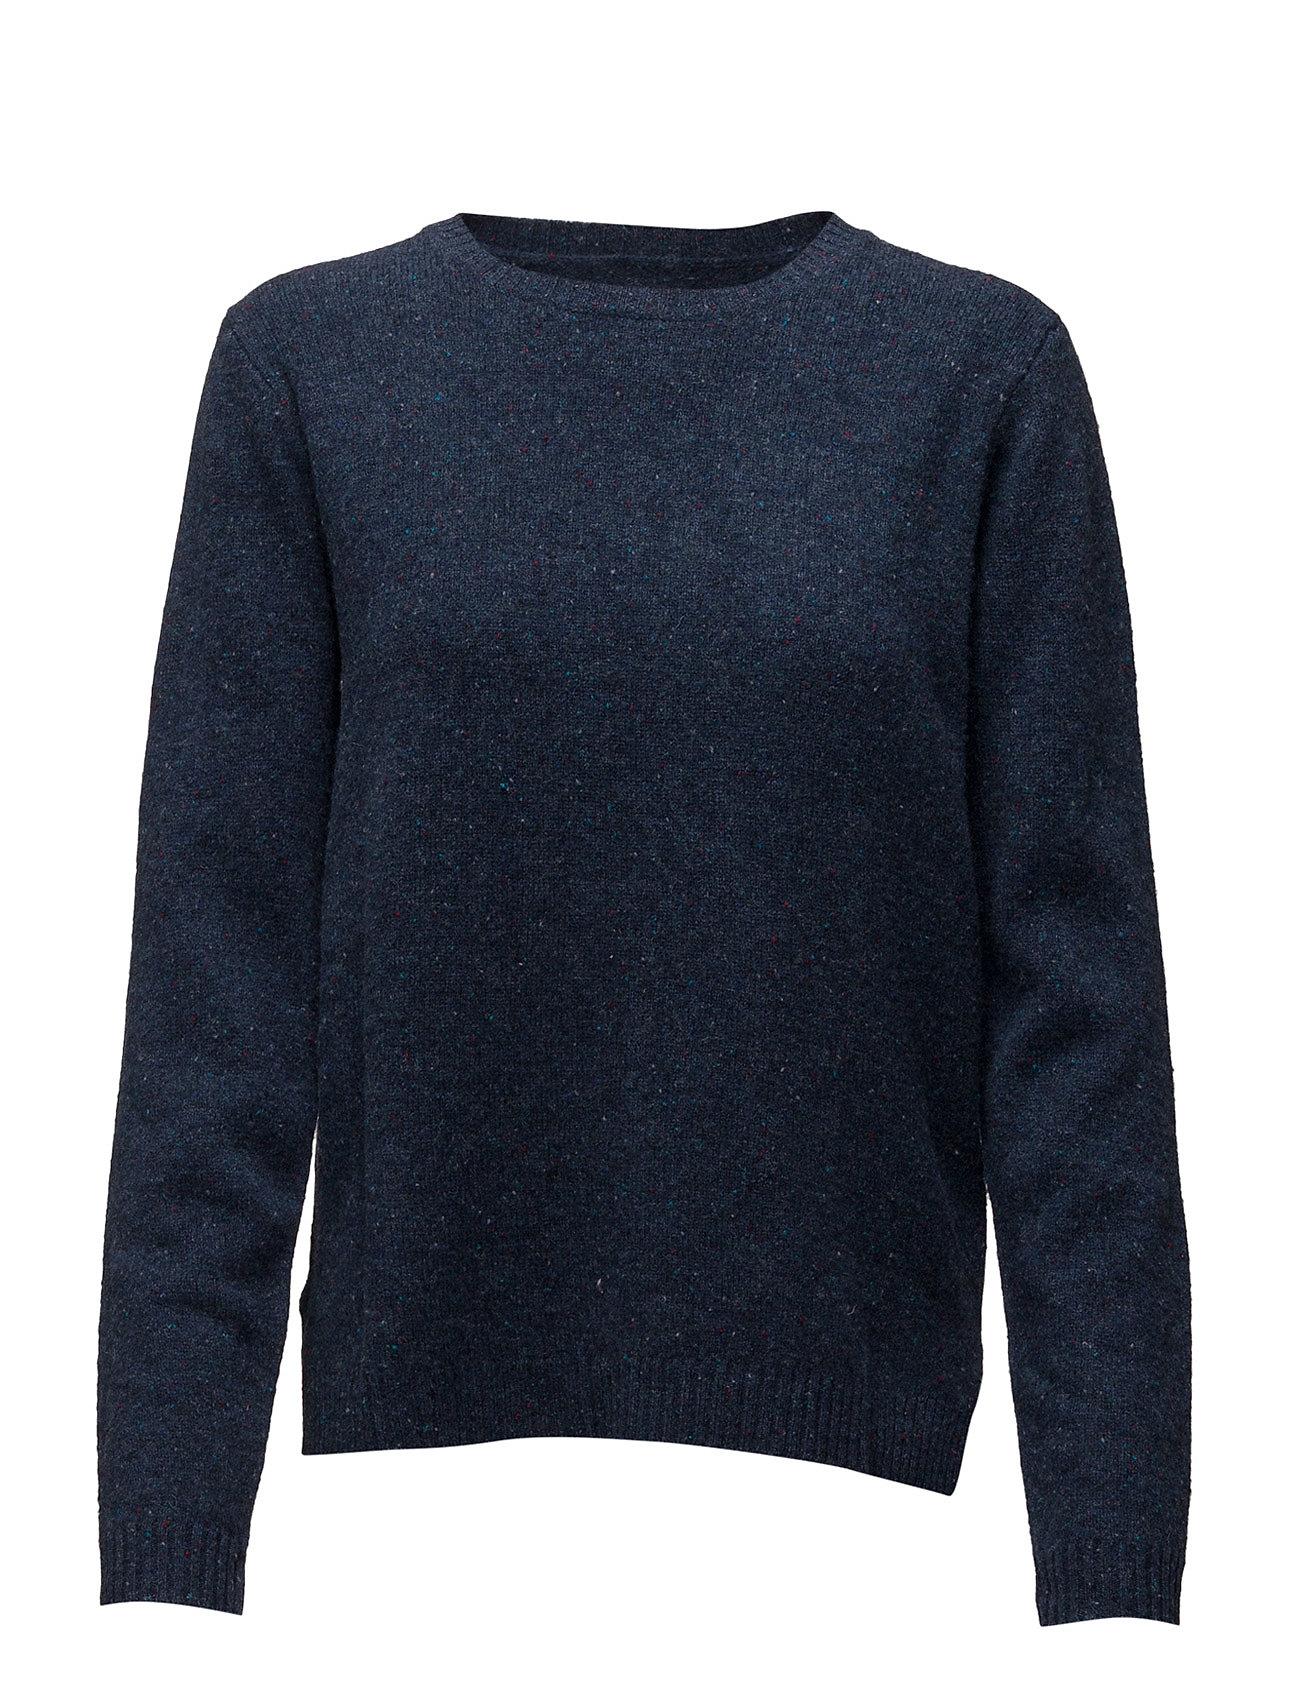 R. The Nep CrÜE GANT Rugger Sweatshirts til Damer i